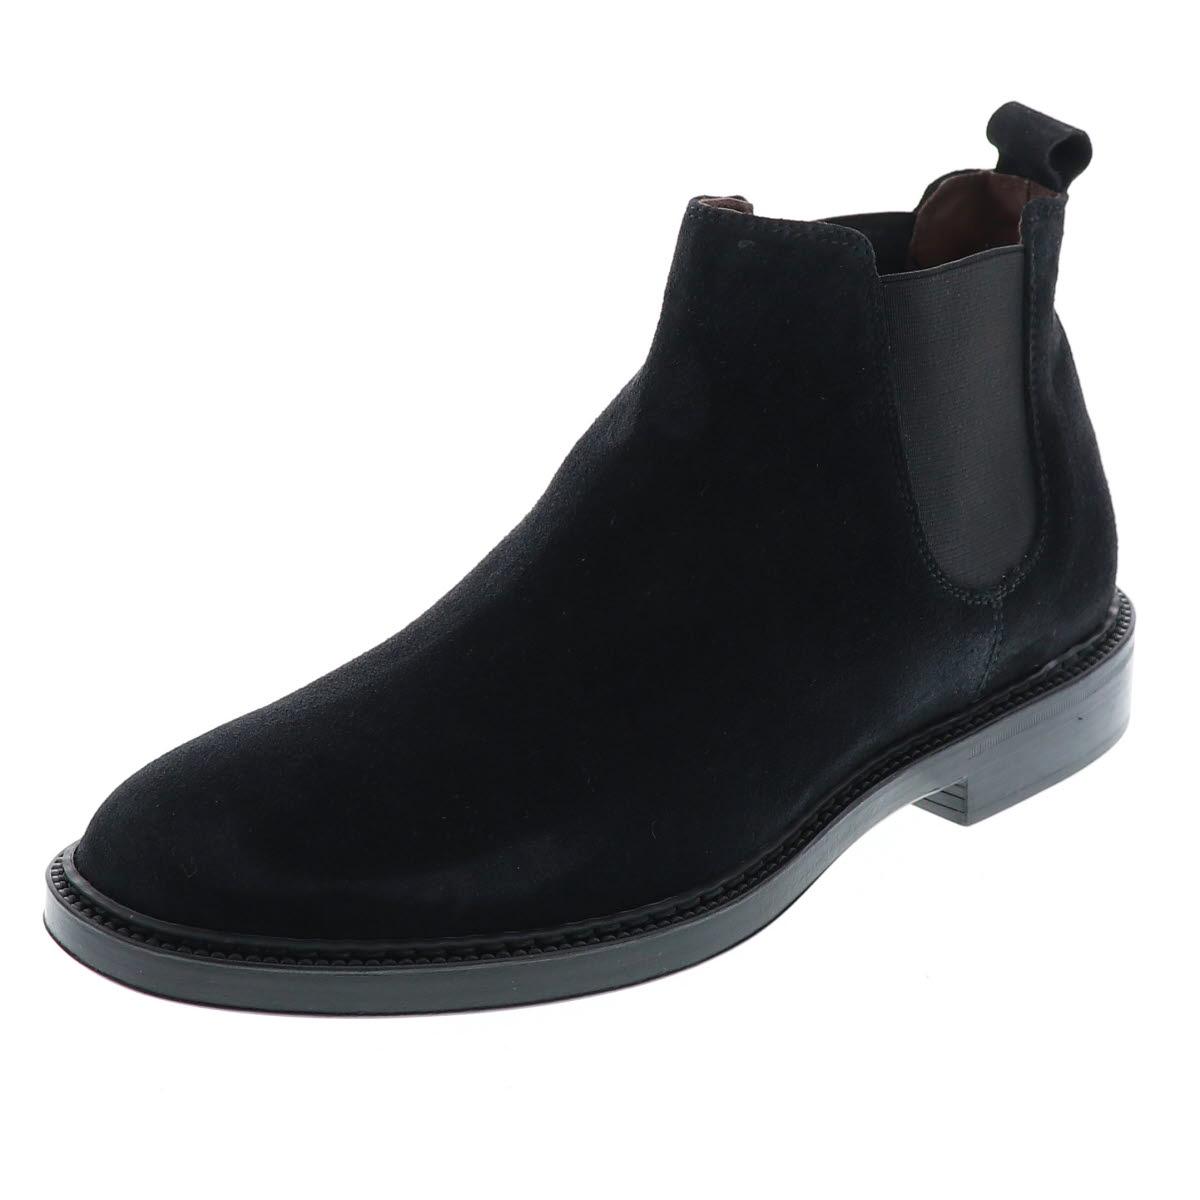 BOEMOS ボエモス メンズシューズ メンズブーツ サイドゴアブーツ 本革 天然皮革 スエード レザー イタリア製 ブラック 黒 BM-4792 BL